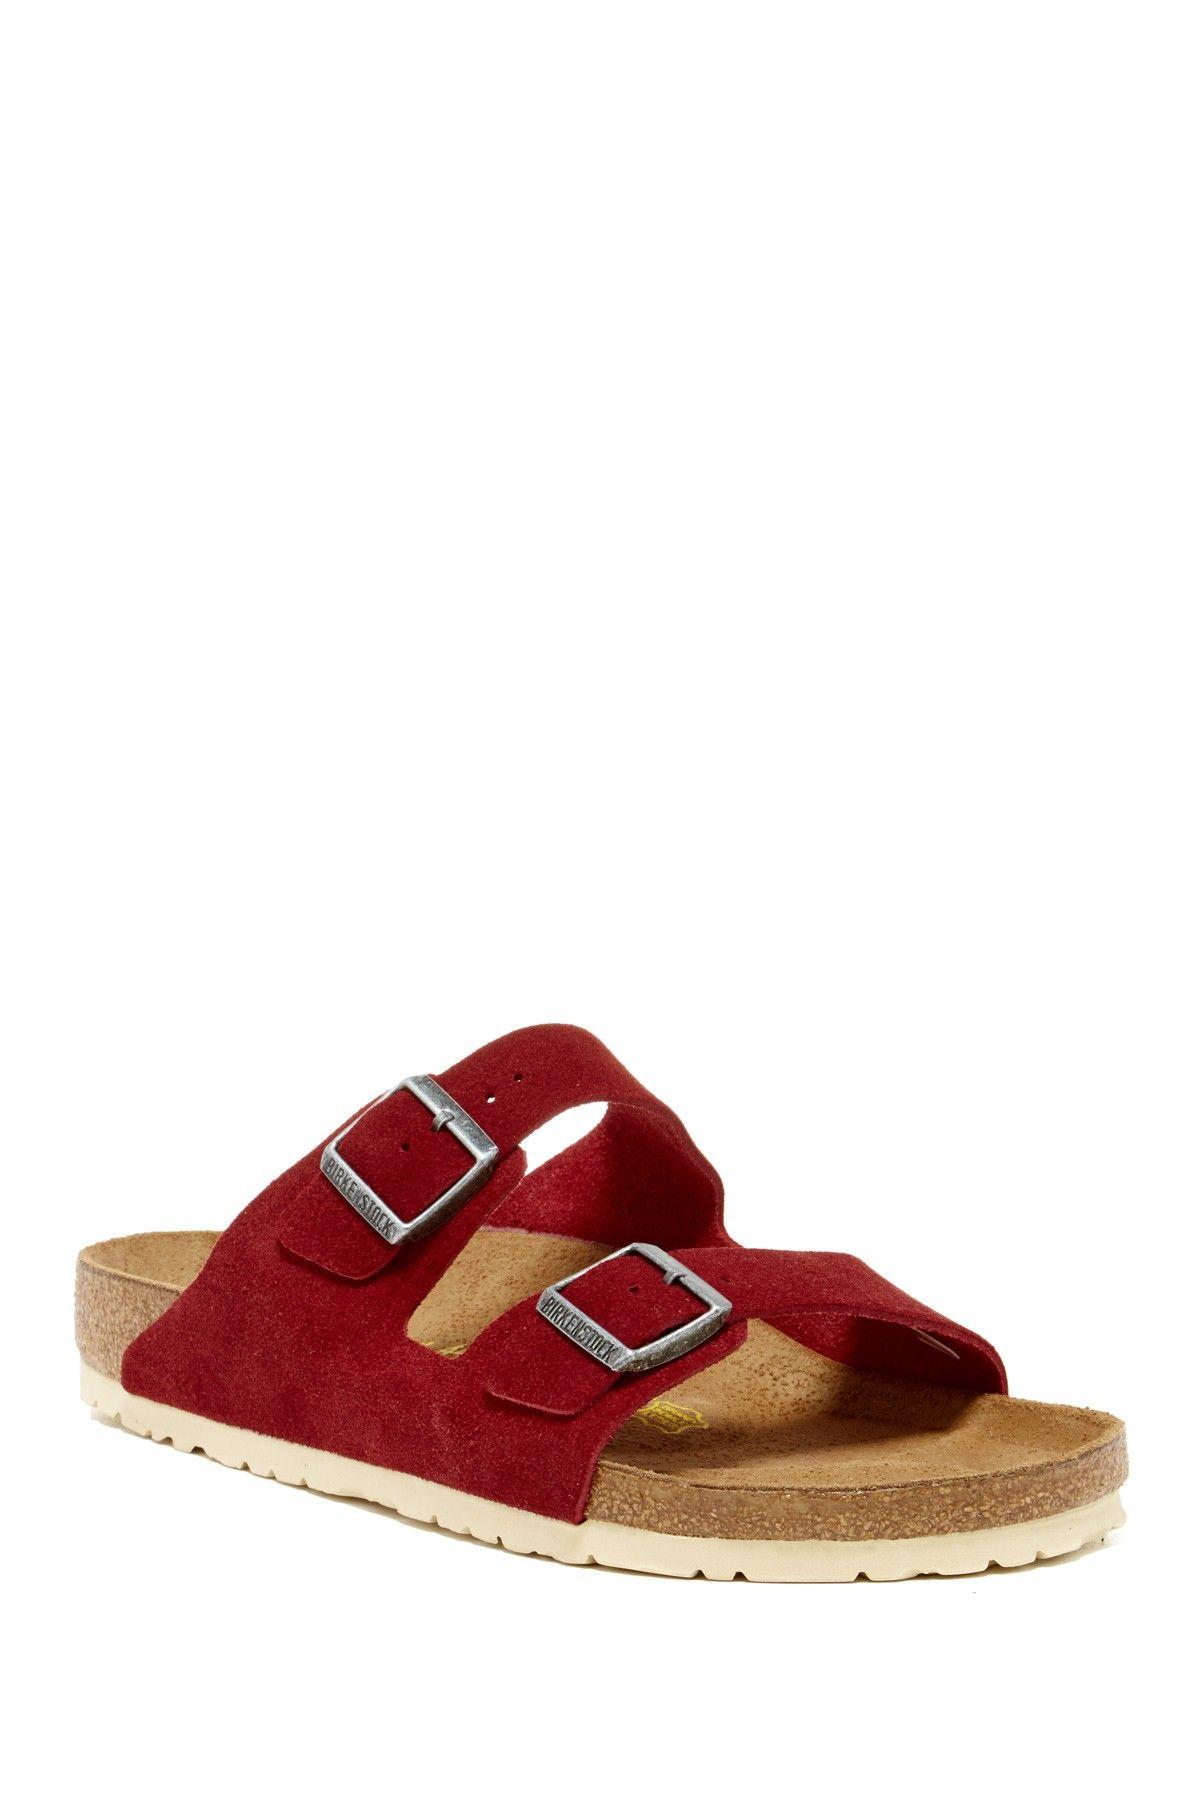 e6f16e2d83f2 Classic Arizona Sandal